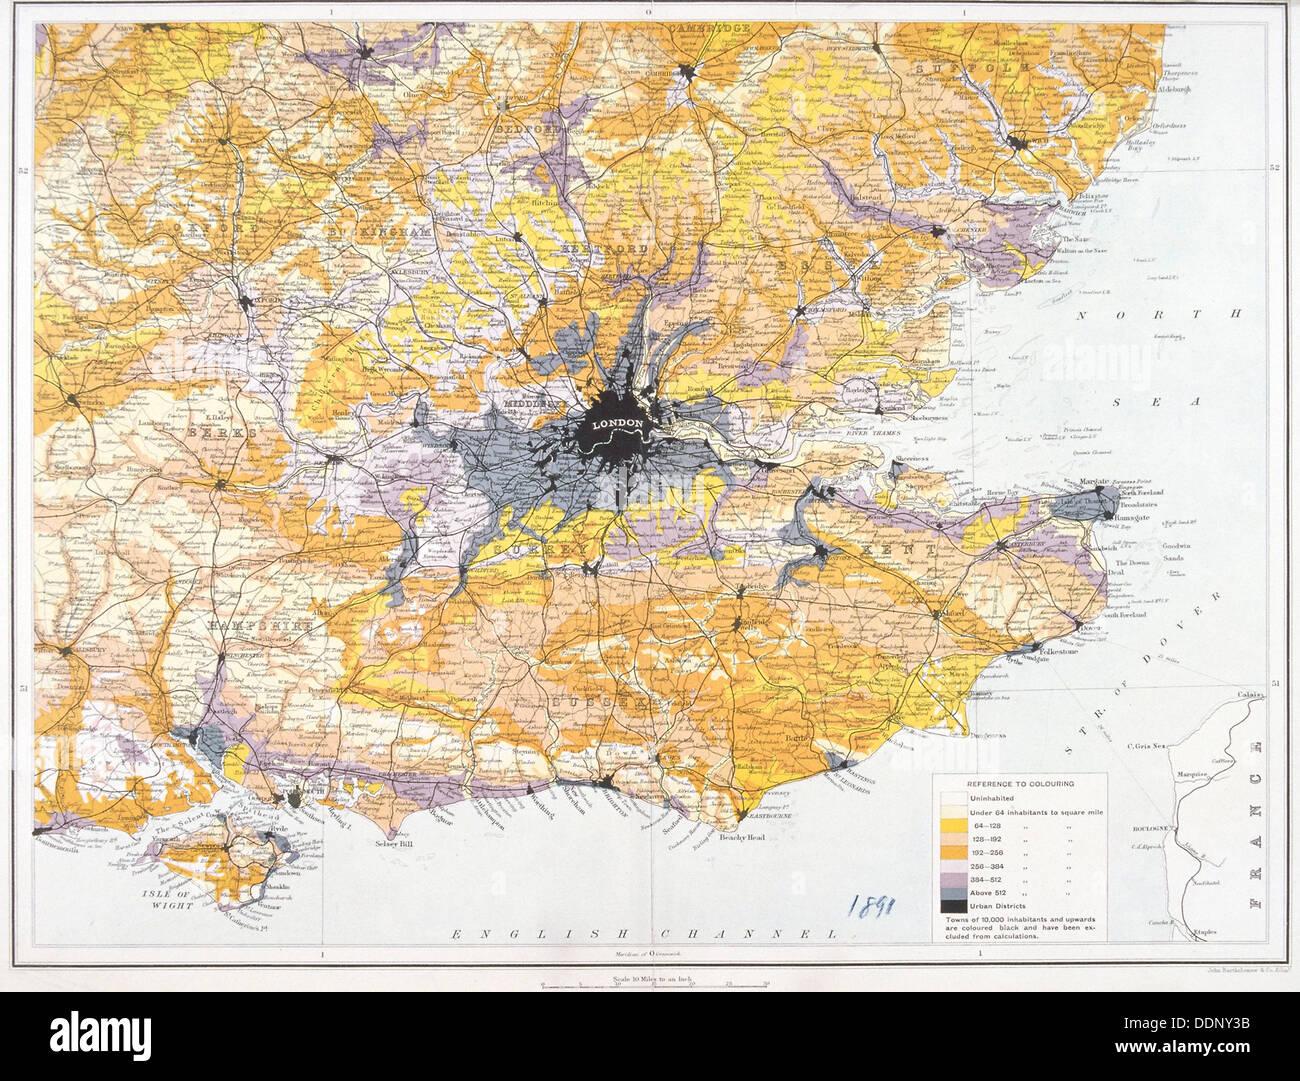 Map of London and south-east England, 1891. Artist: John Bartholomew - Stock Image